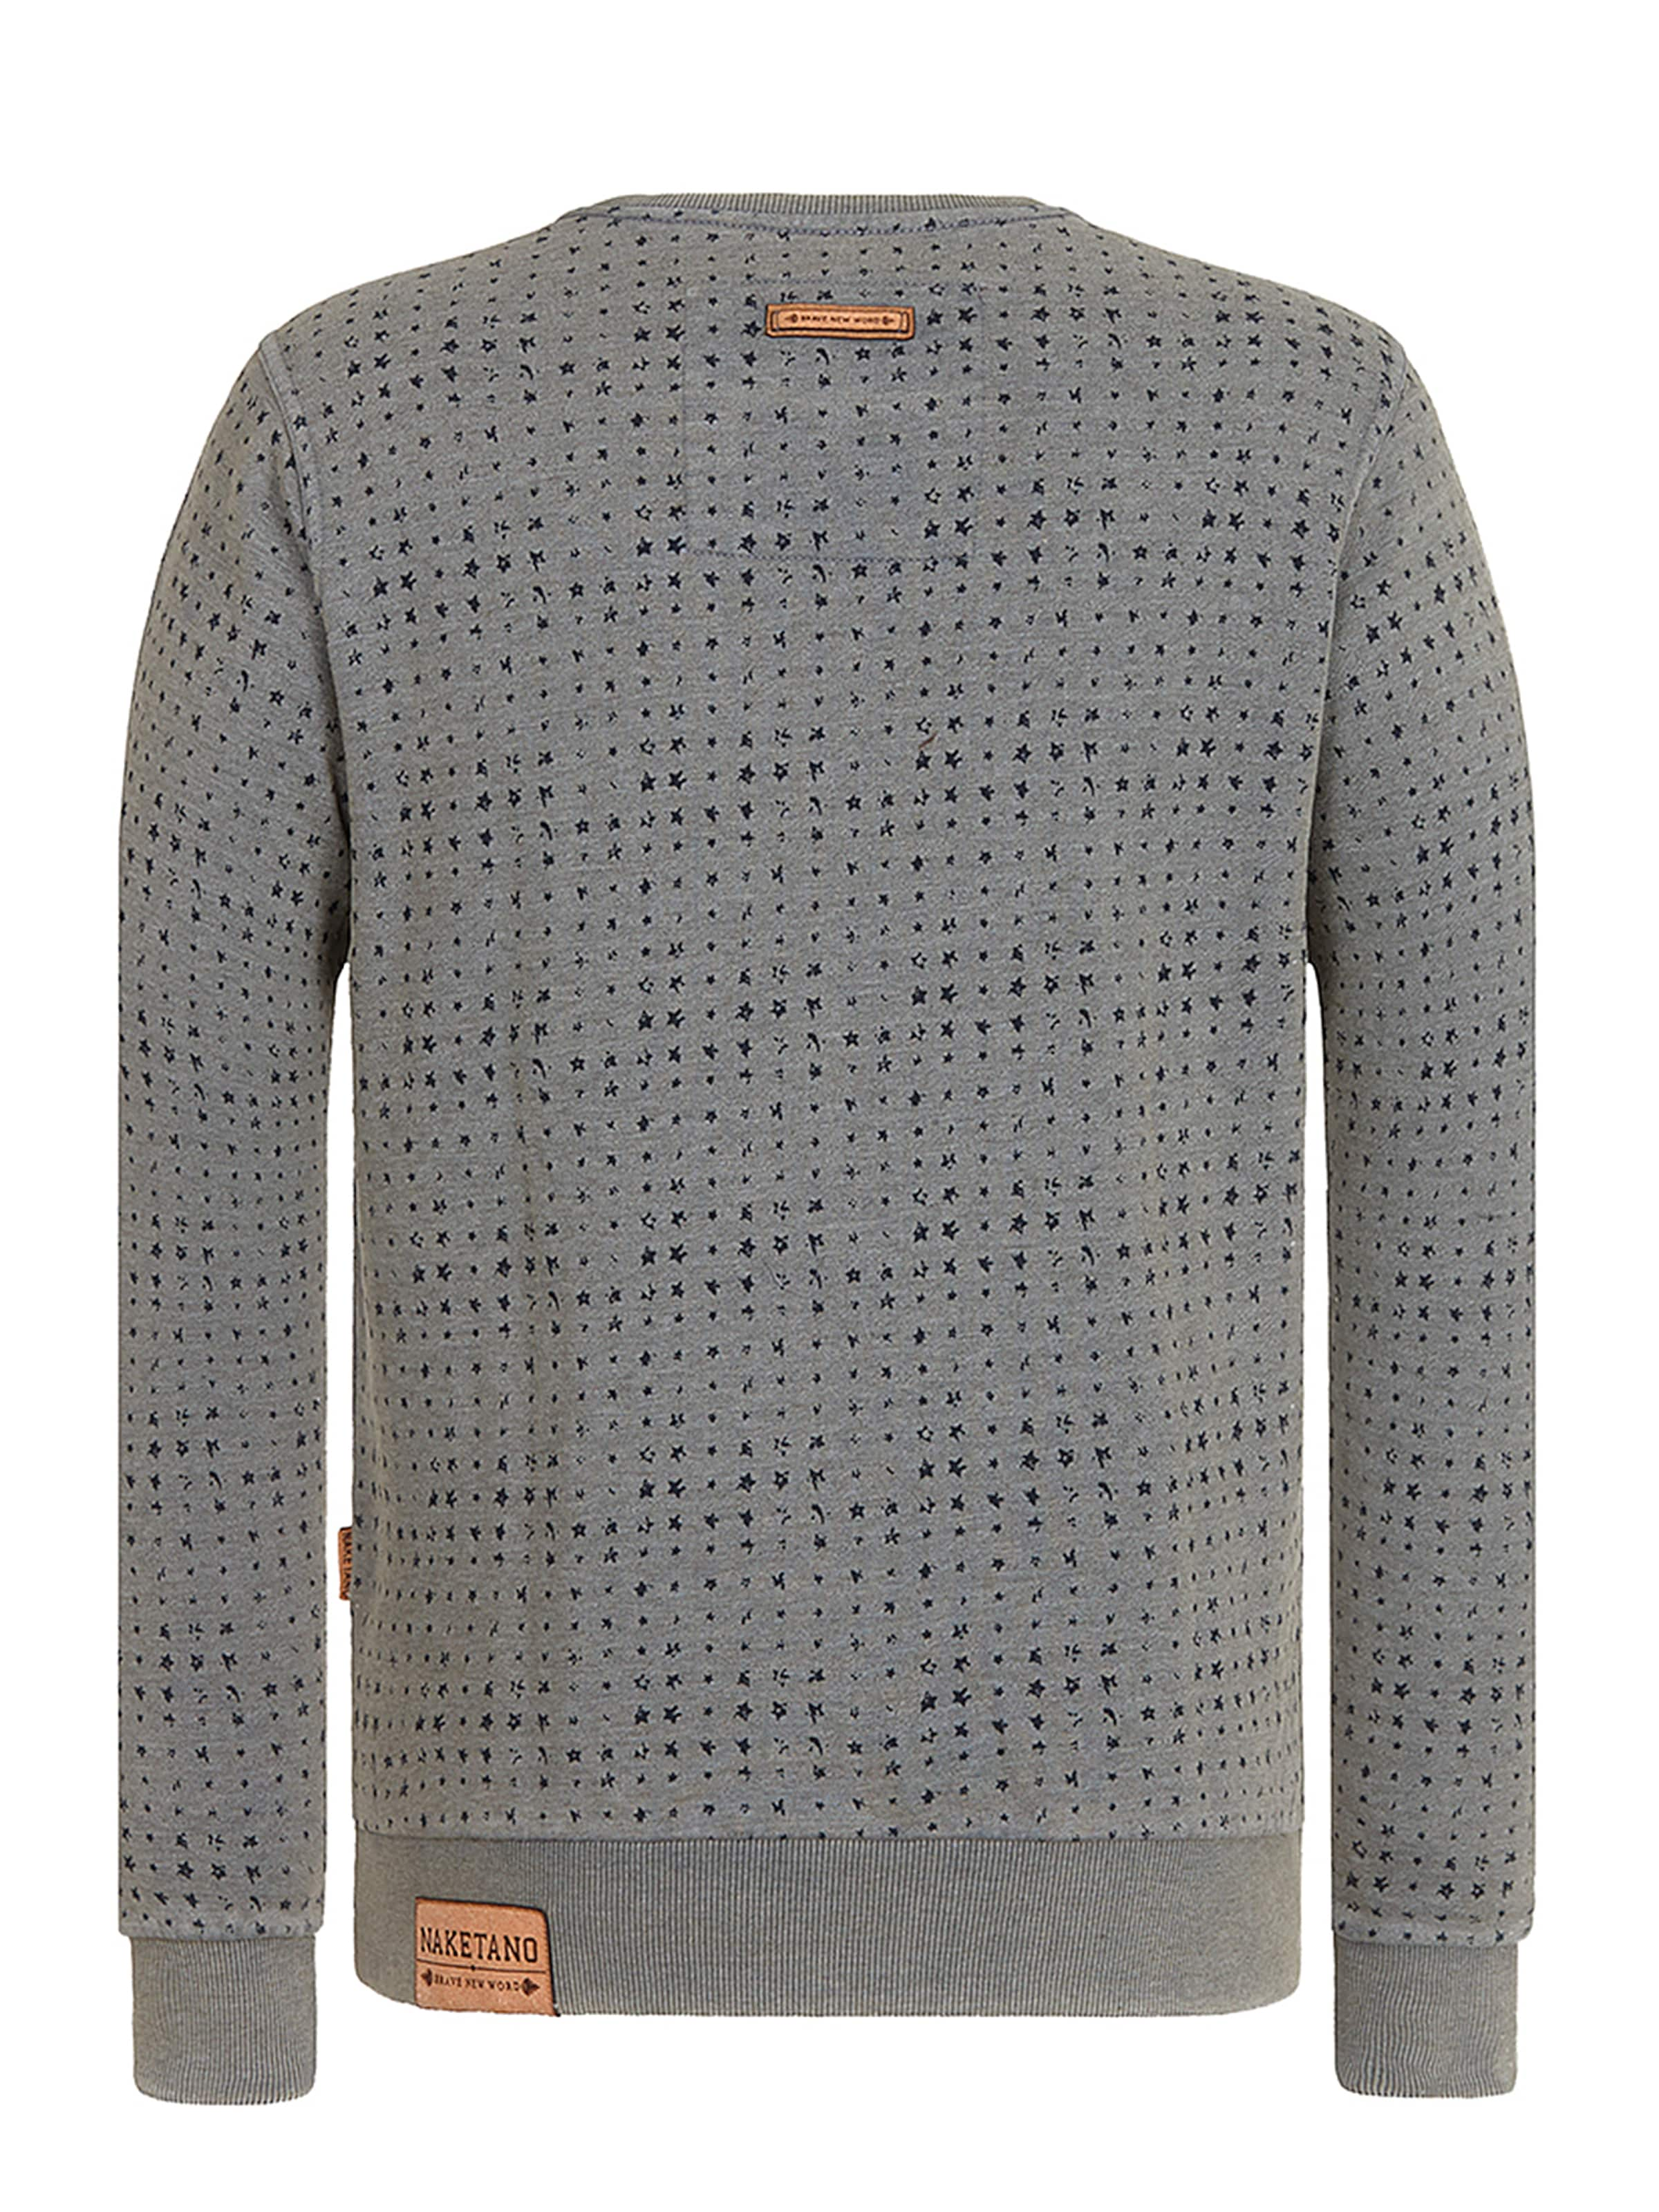 Aufm In Sweatshirt 'tinte Iii' Naketano Füller Grau PXuwkiTOZ